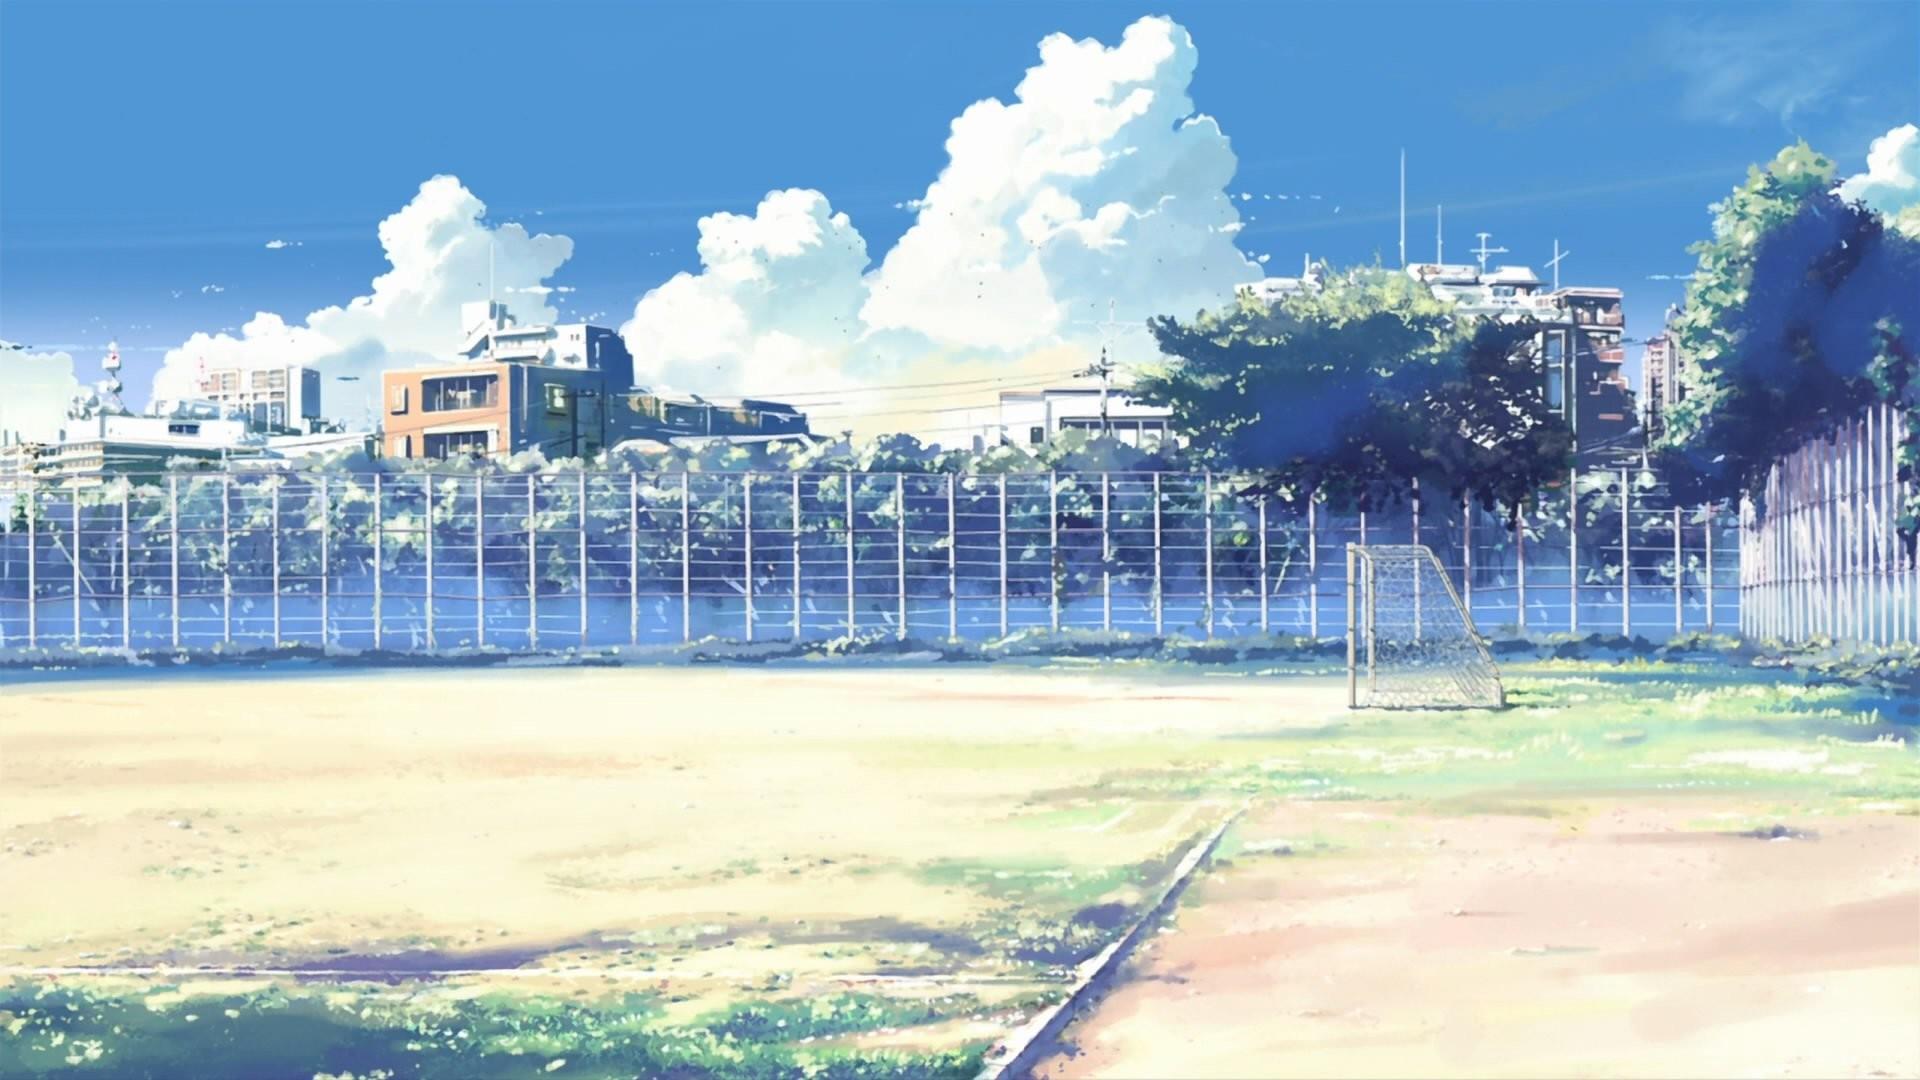 Makoto Shinkai Wallpapers 92 Images